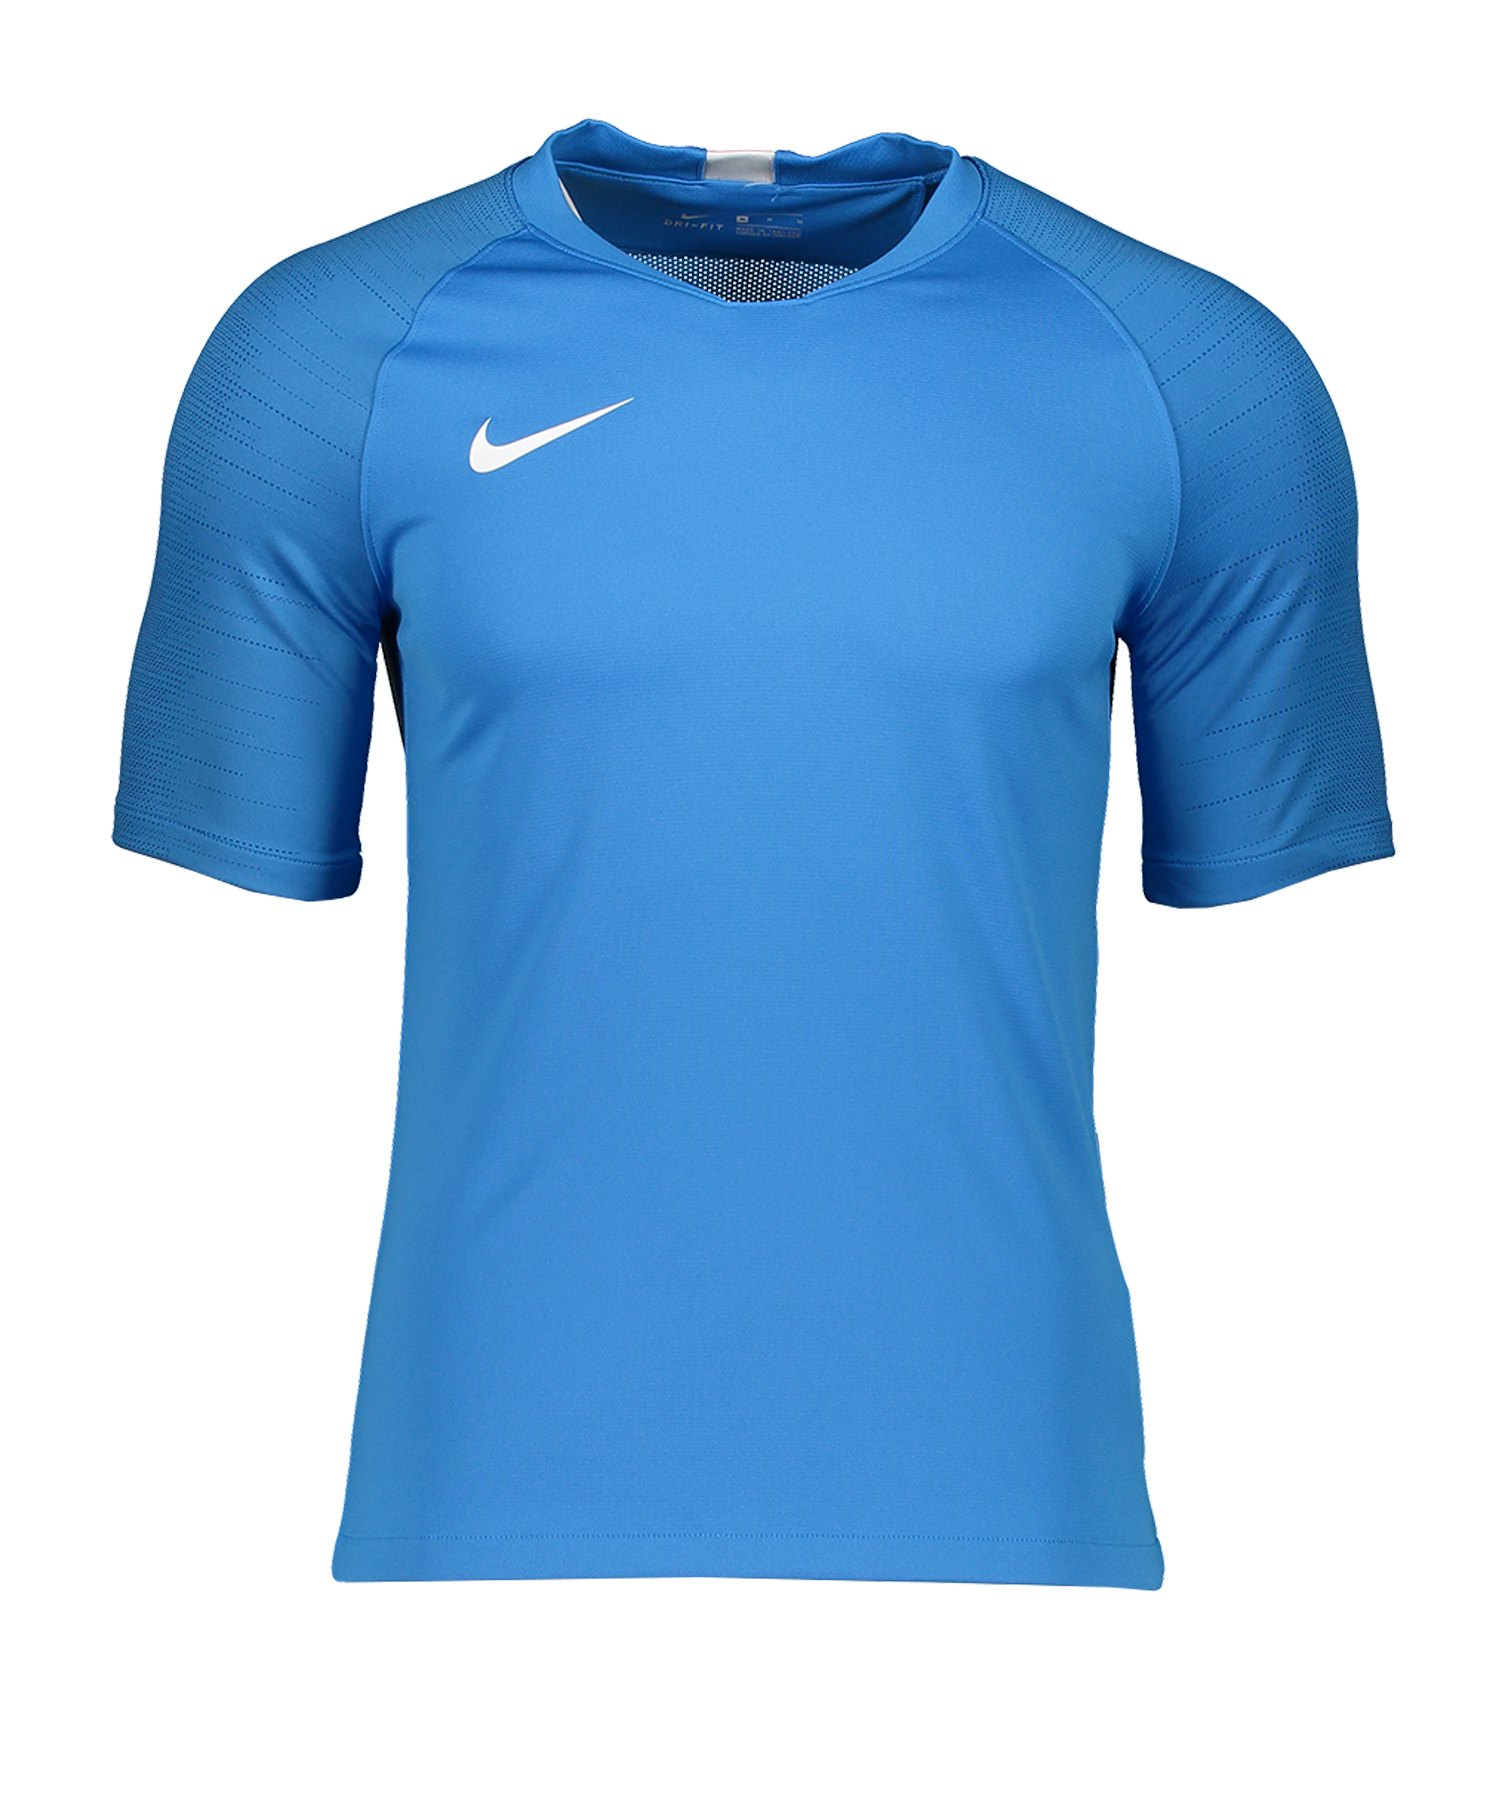 Nike Dri-FIT Breathe Strike Trainingsshirt F435 - blau